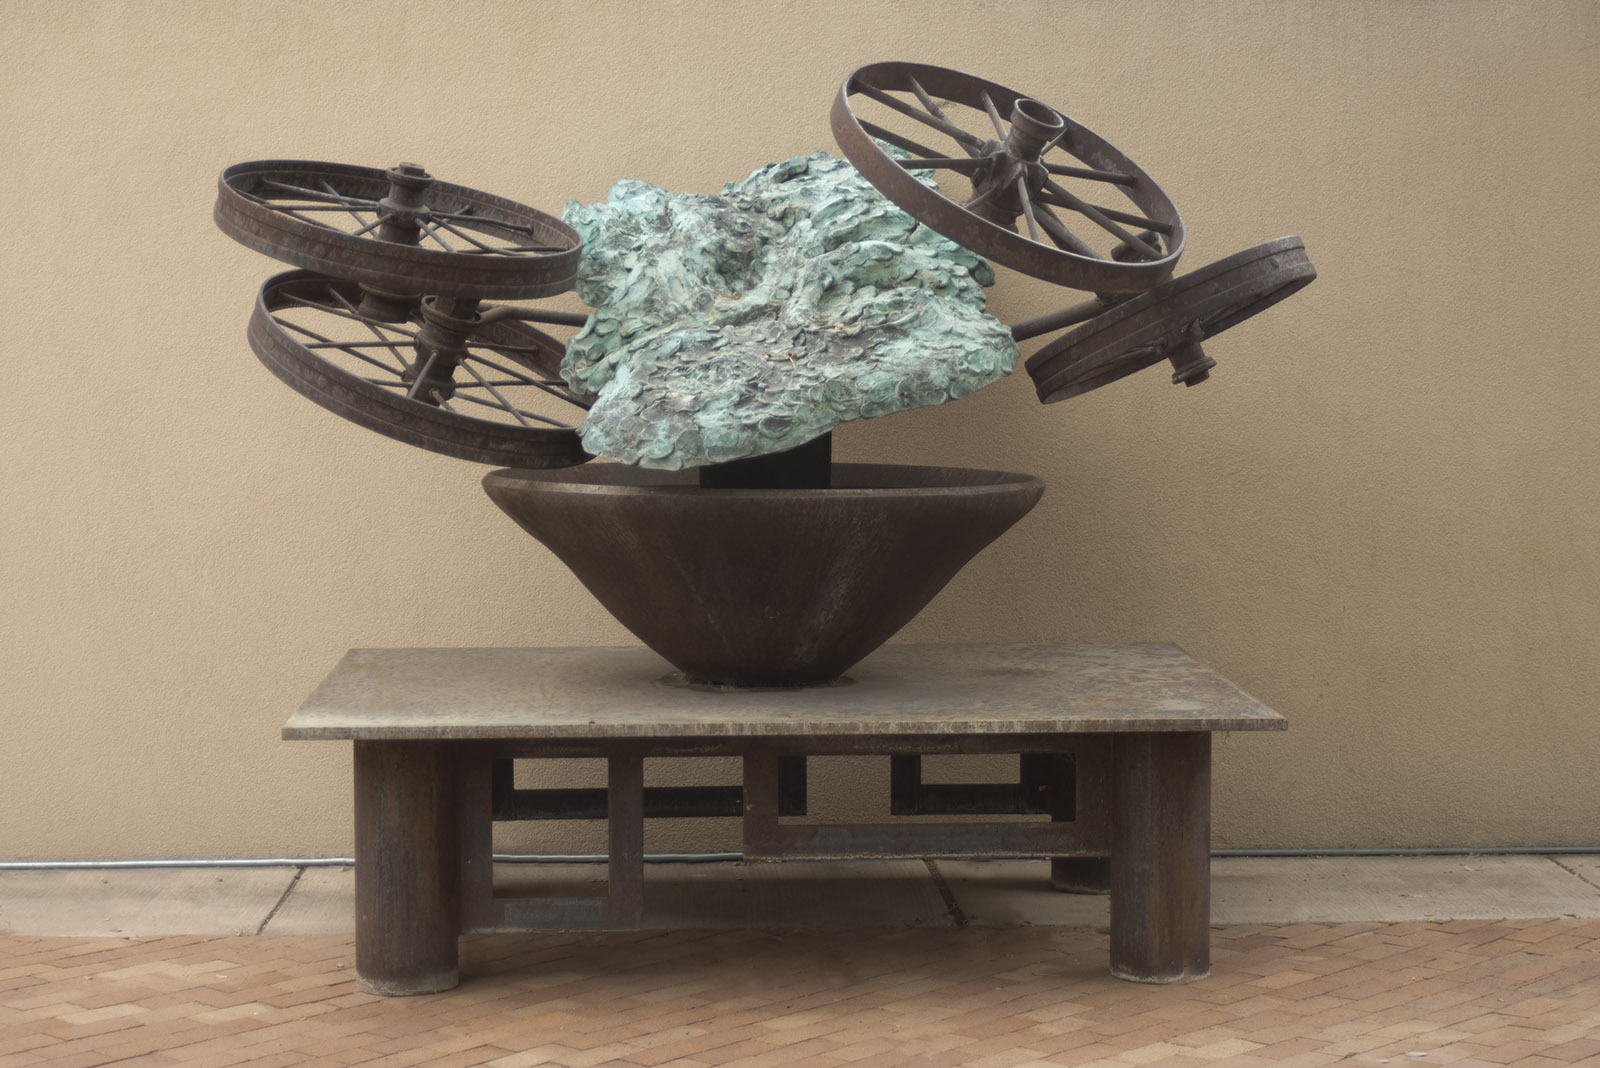 David Anderson, Tea and Steam